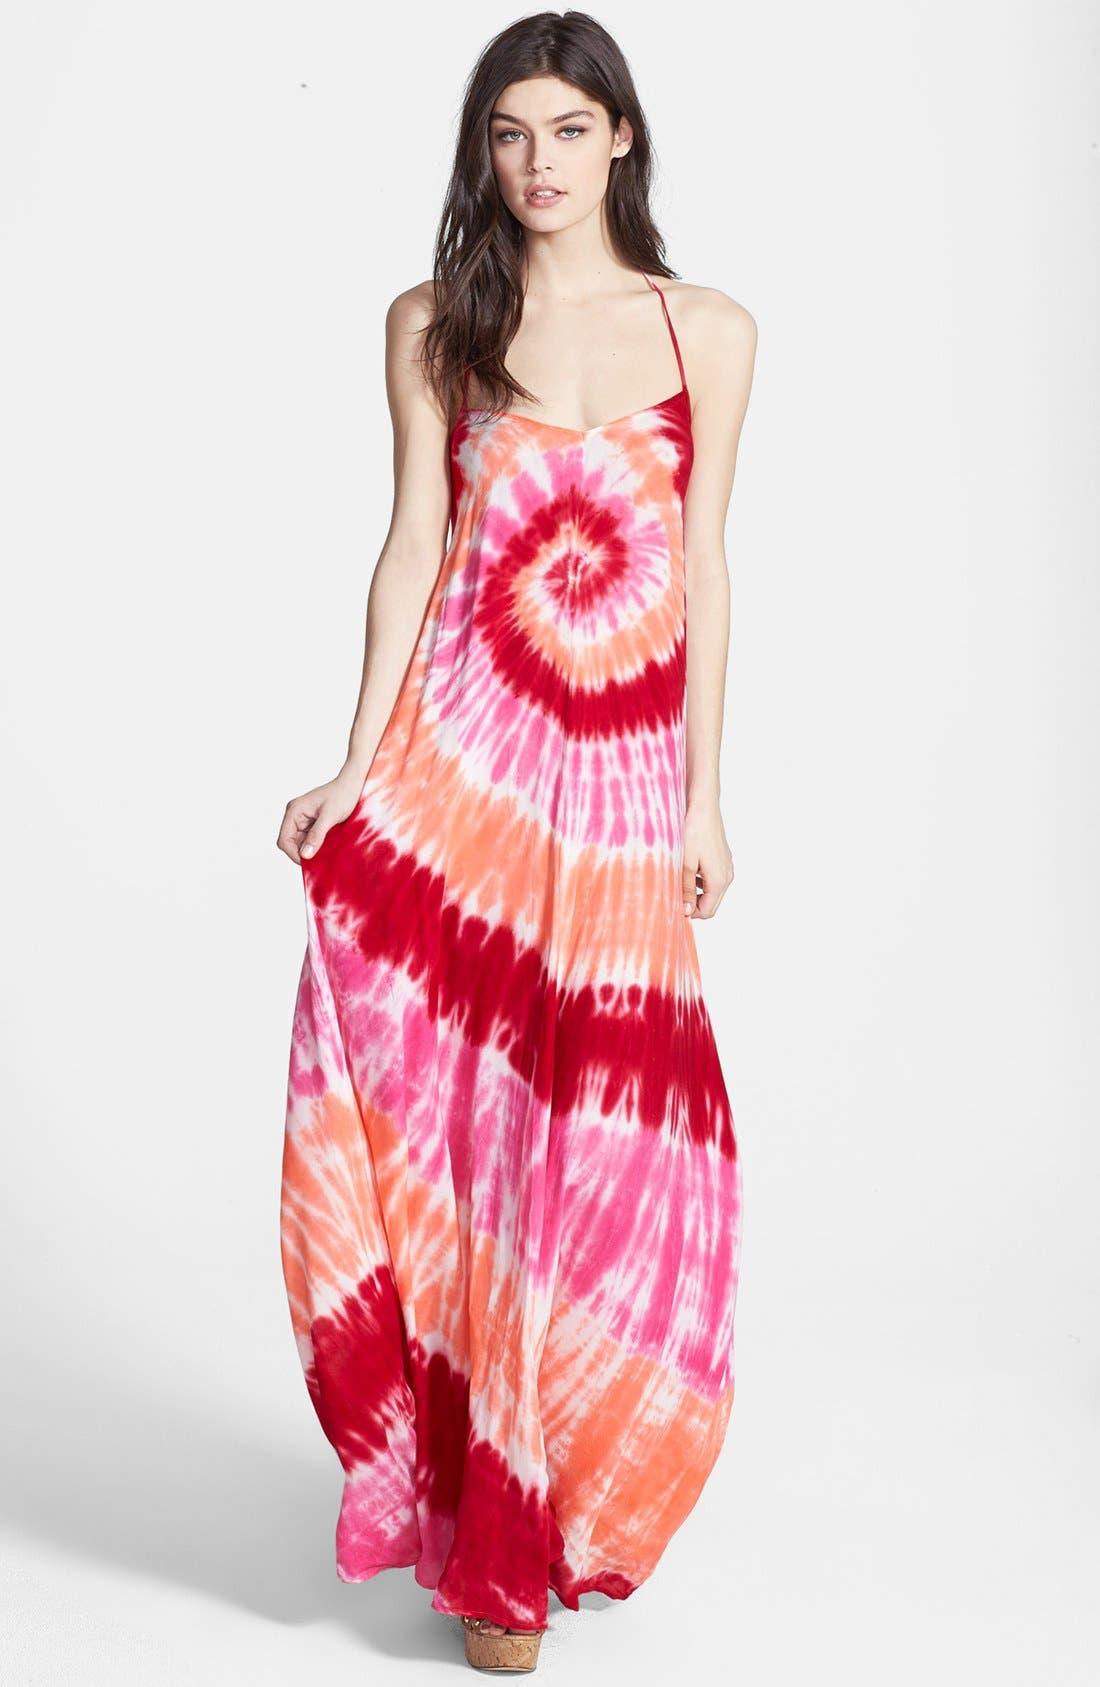 Alternate Image 1 Selected - Young, Fabulous & Broke 'Fortune' Tie Dye Maxi Dress